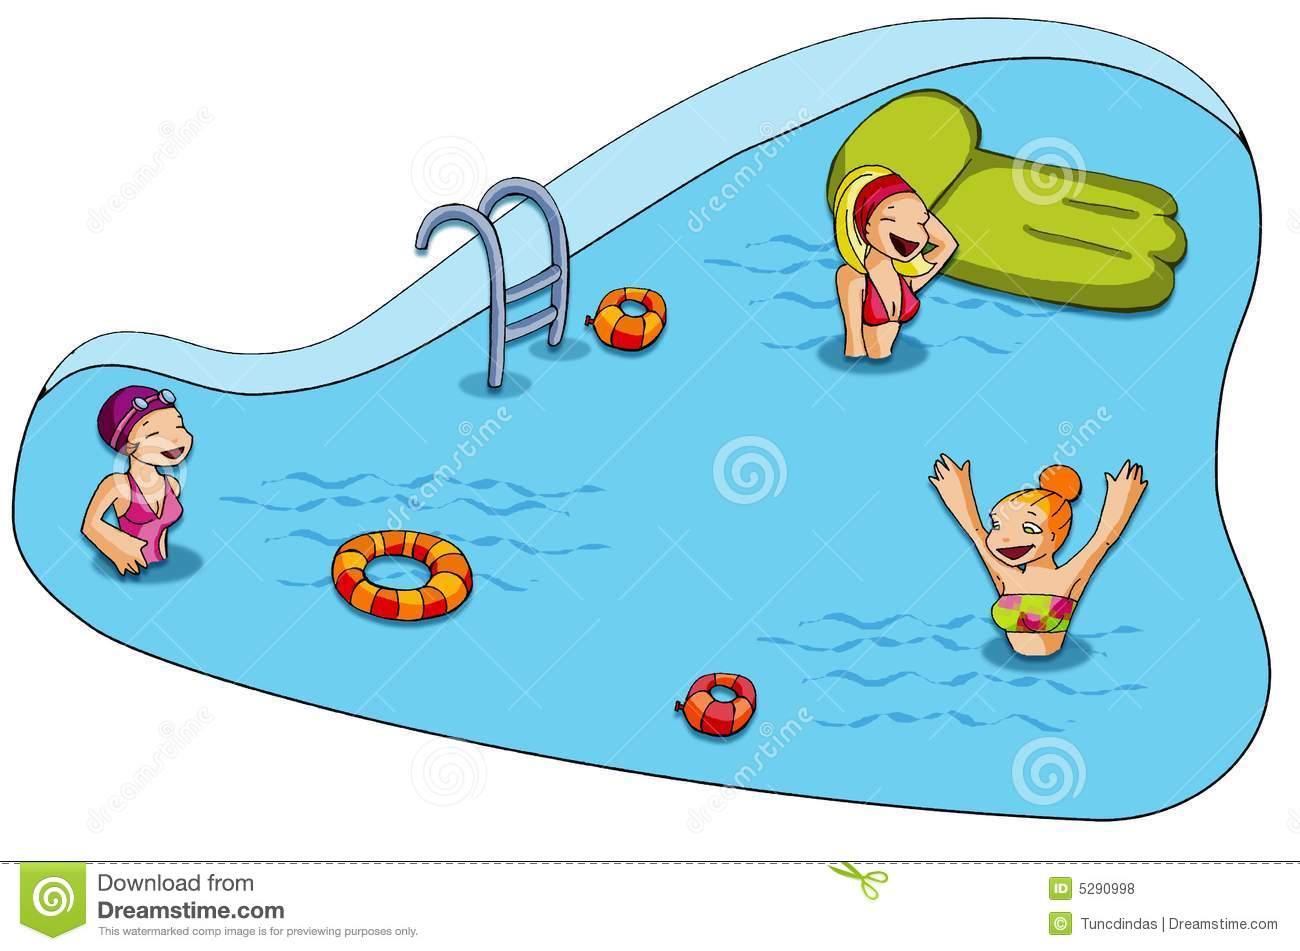 Swimming Pool Royalty Free Stock Photos -Swimming Pool Royalty Free Stock Photos Image 5290998-6